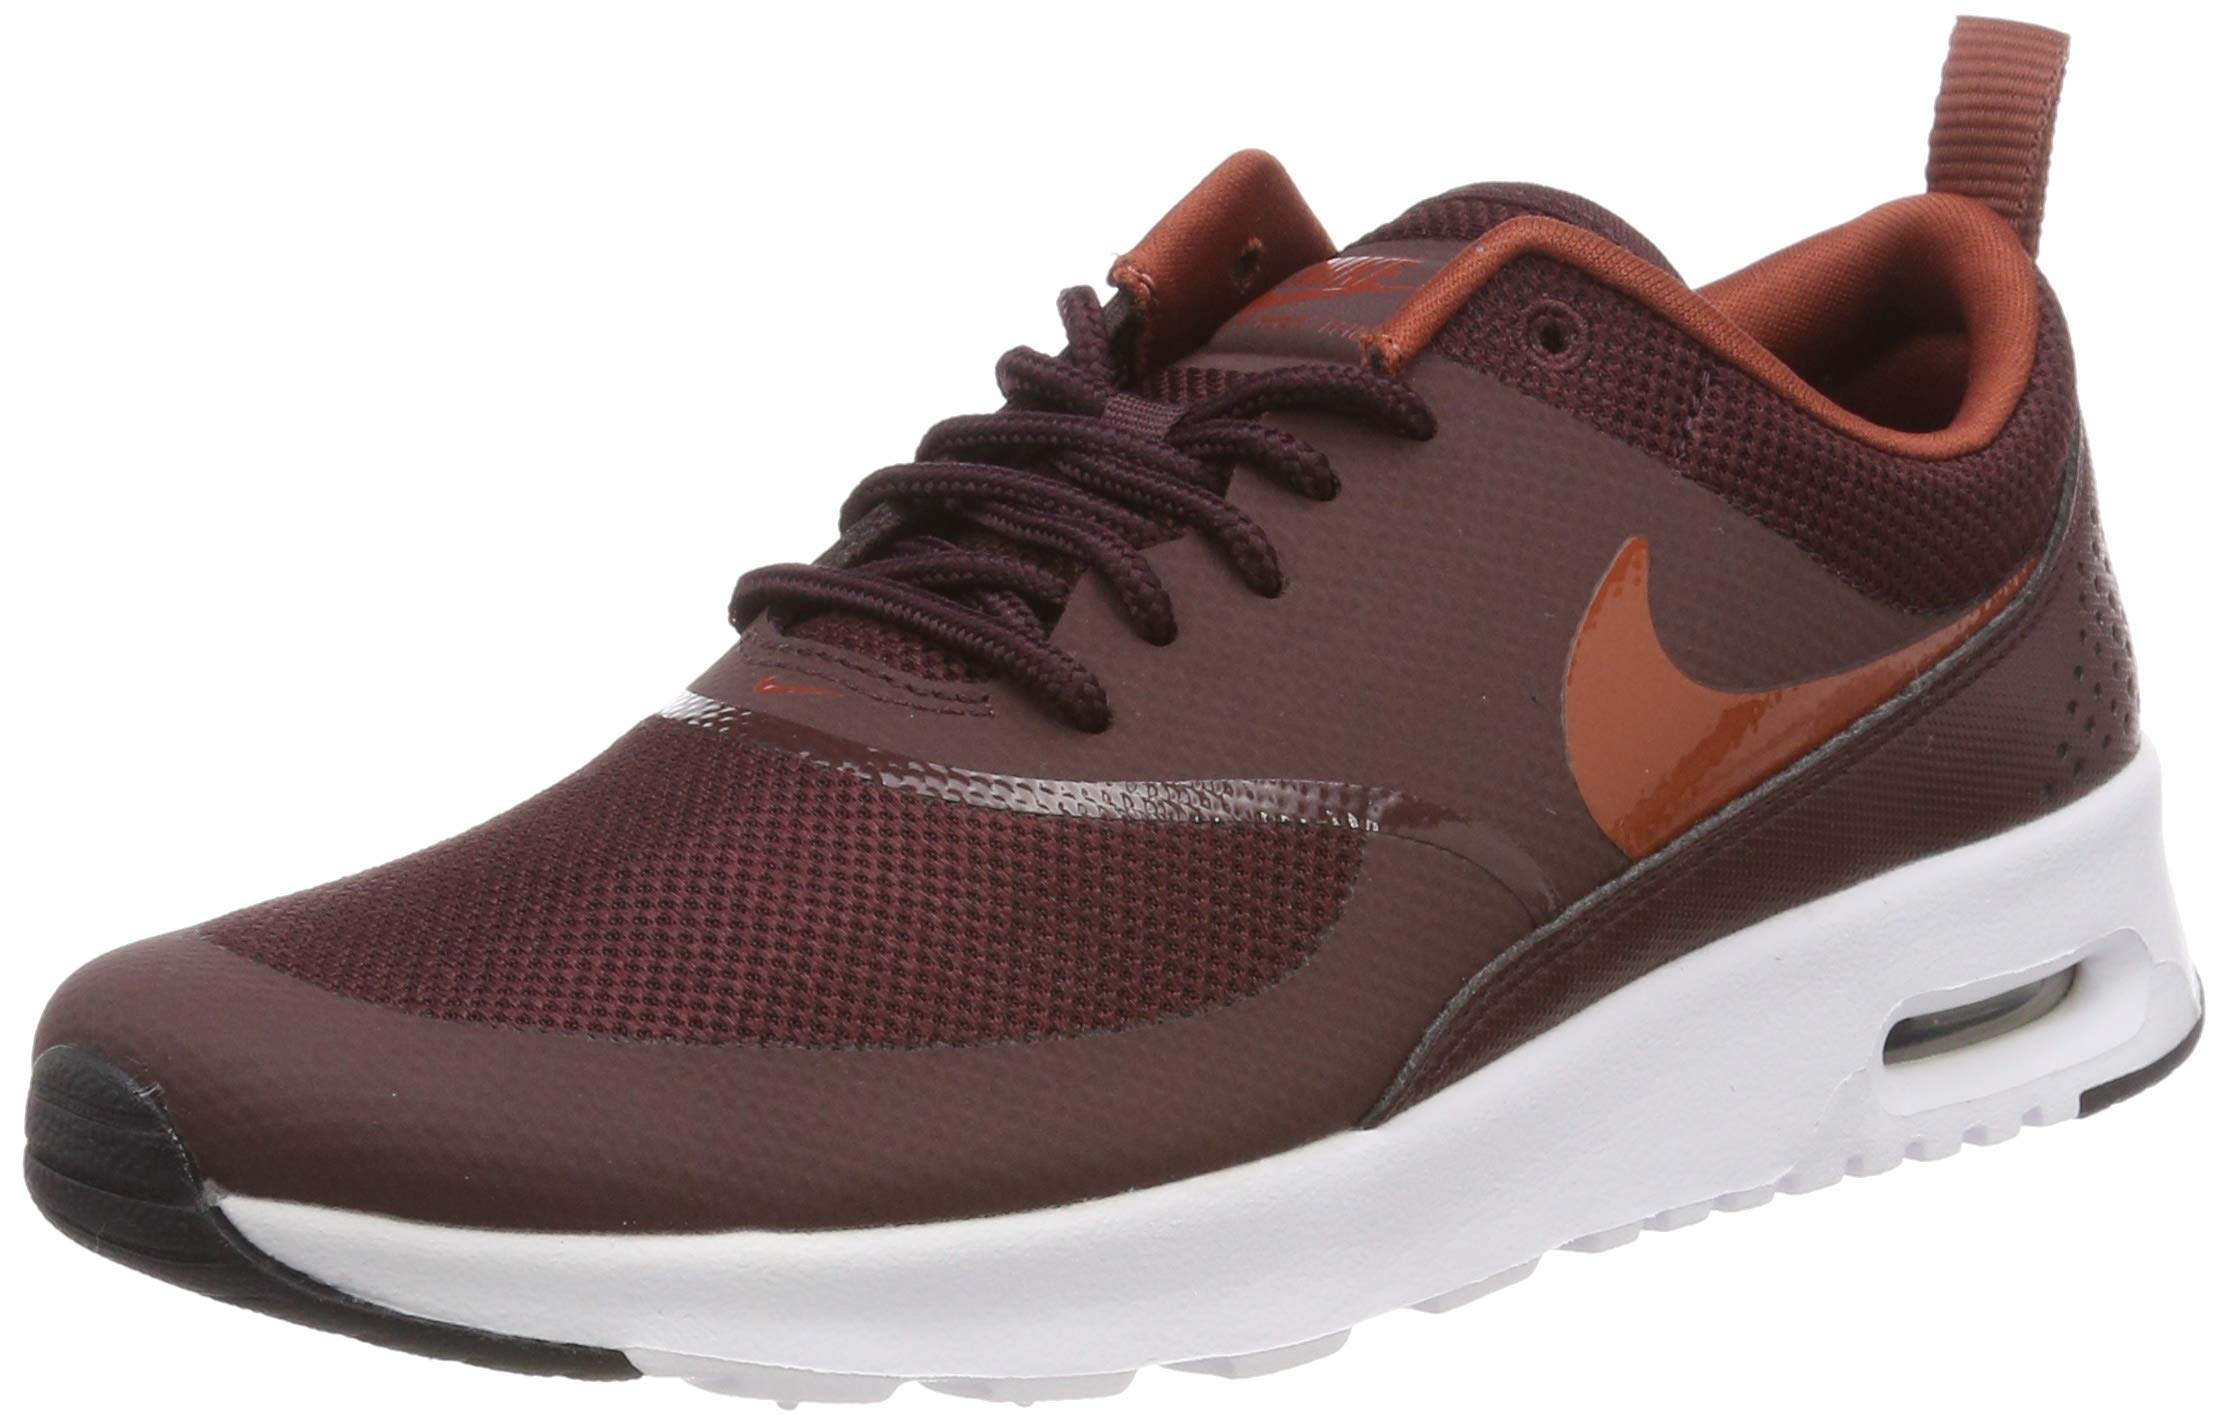 Nike Air Max Thea Women's Sneakers Price in UAE   Amazon.ae